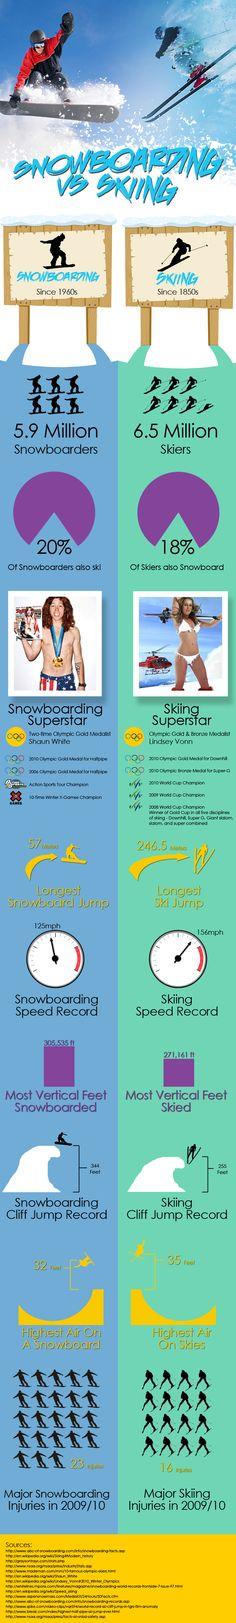 Snowboarding vs Skiing [Infographic]